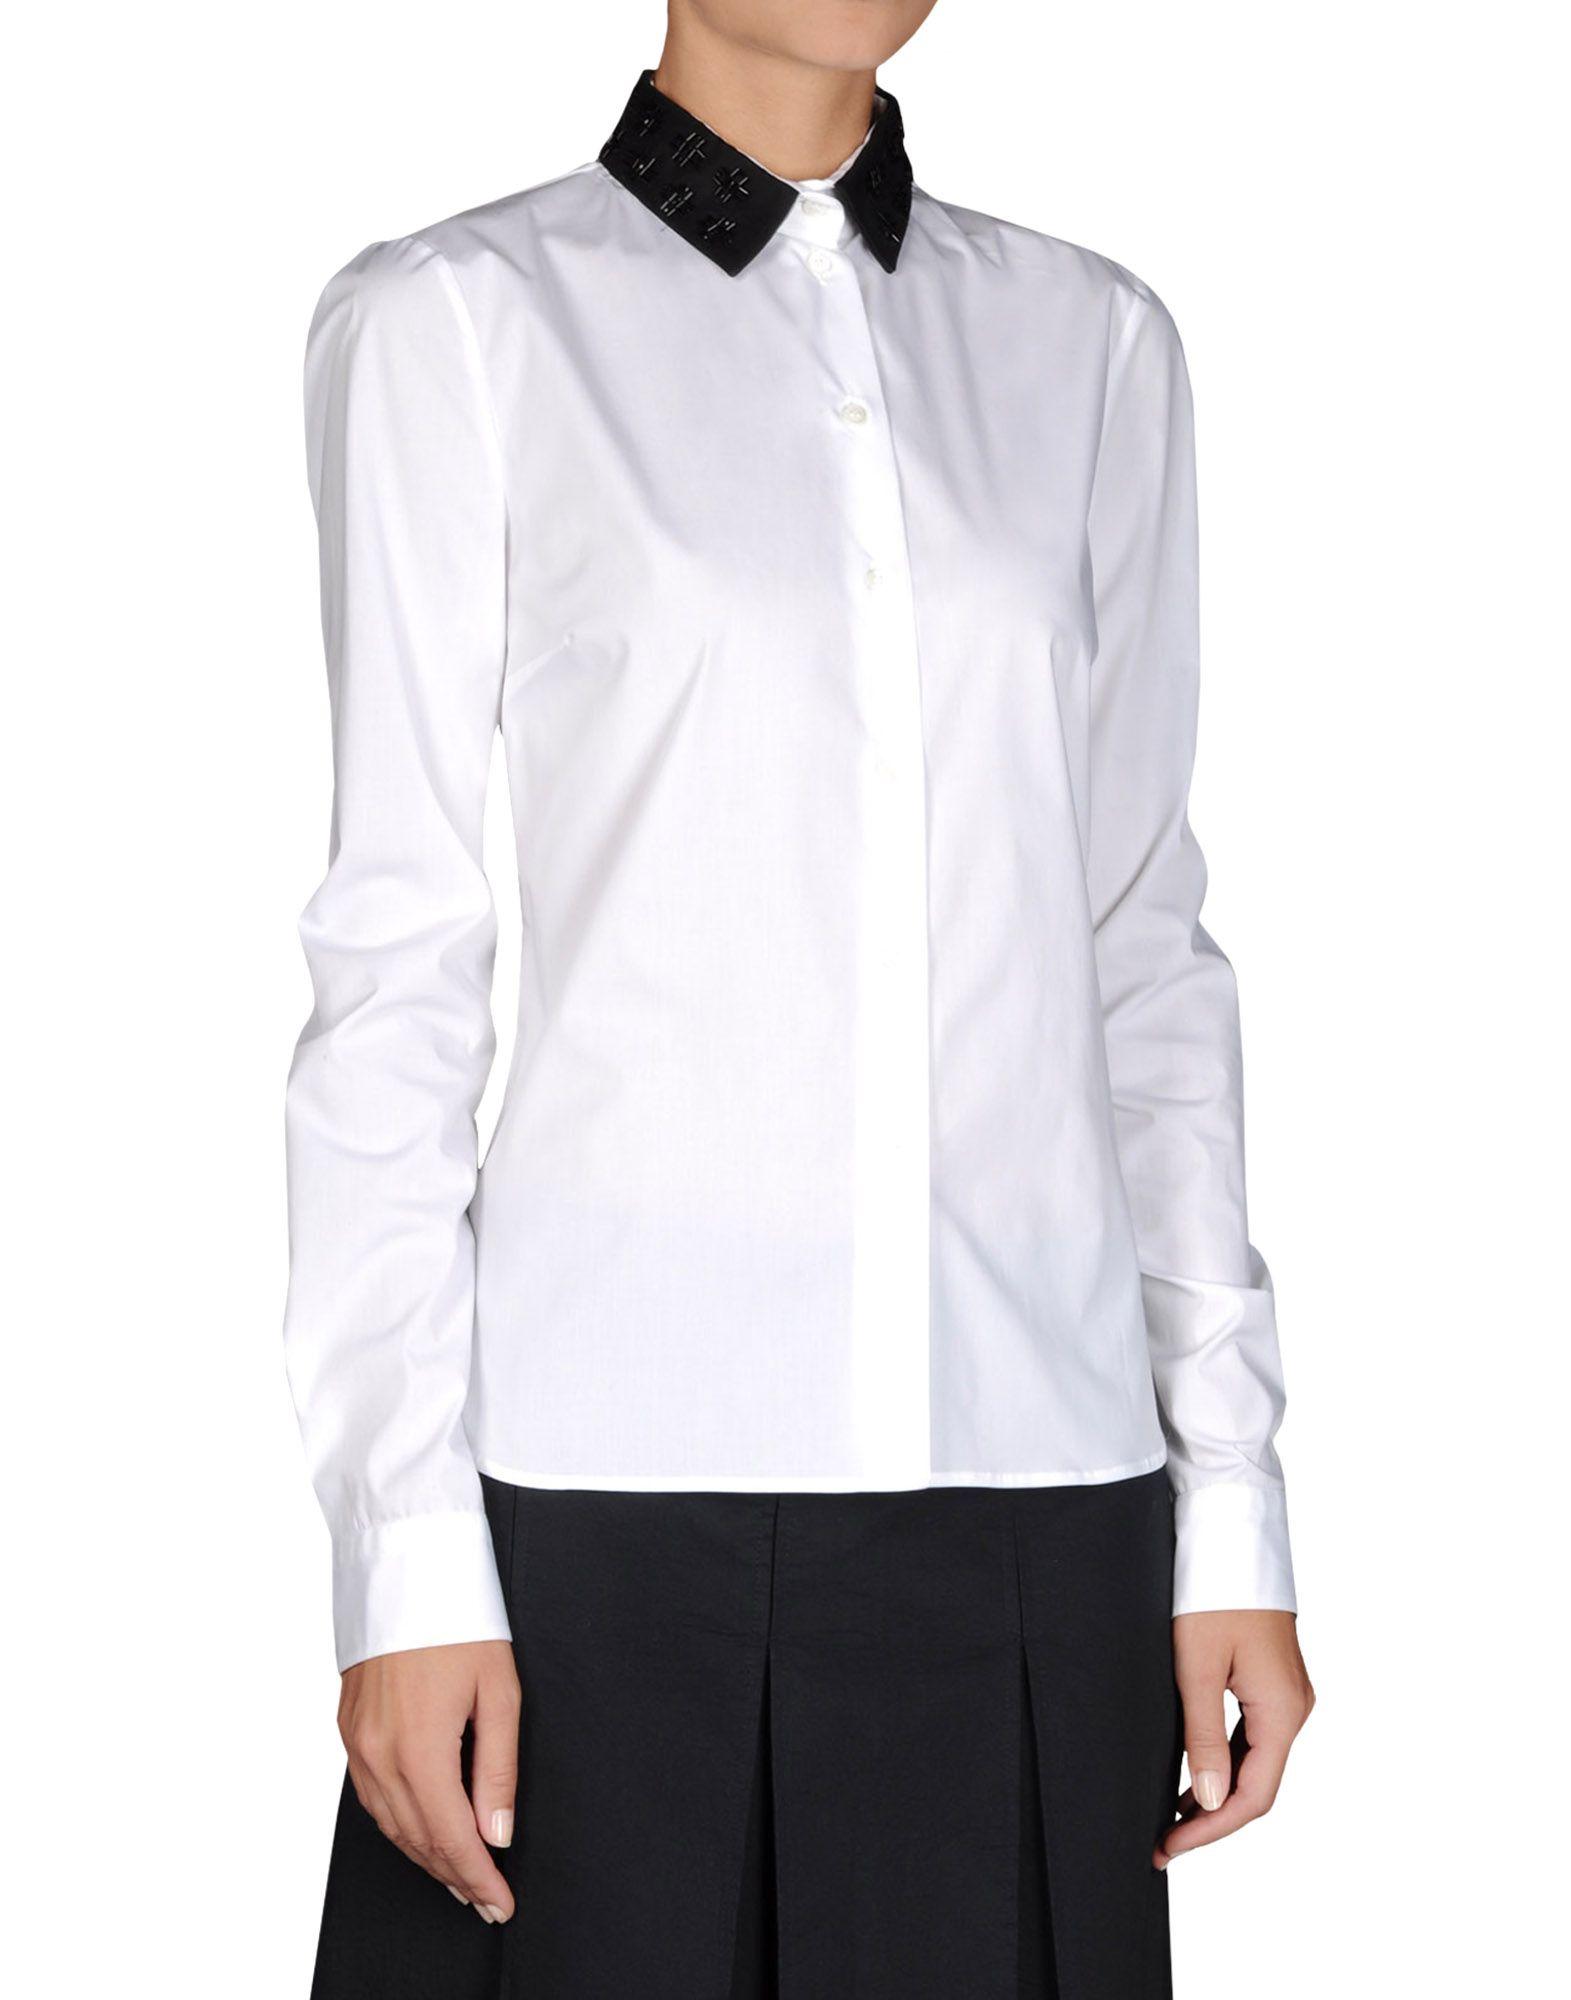 Shirt - JIL SANDER NAVY Online Store